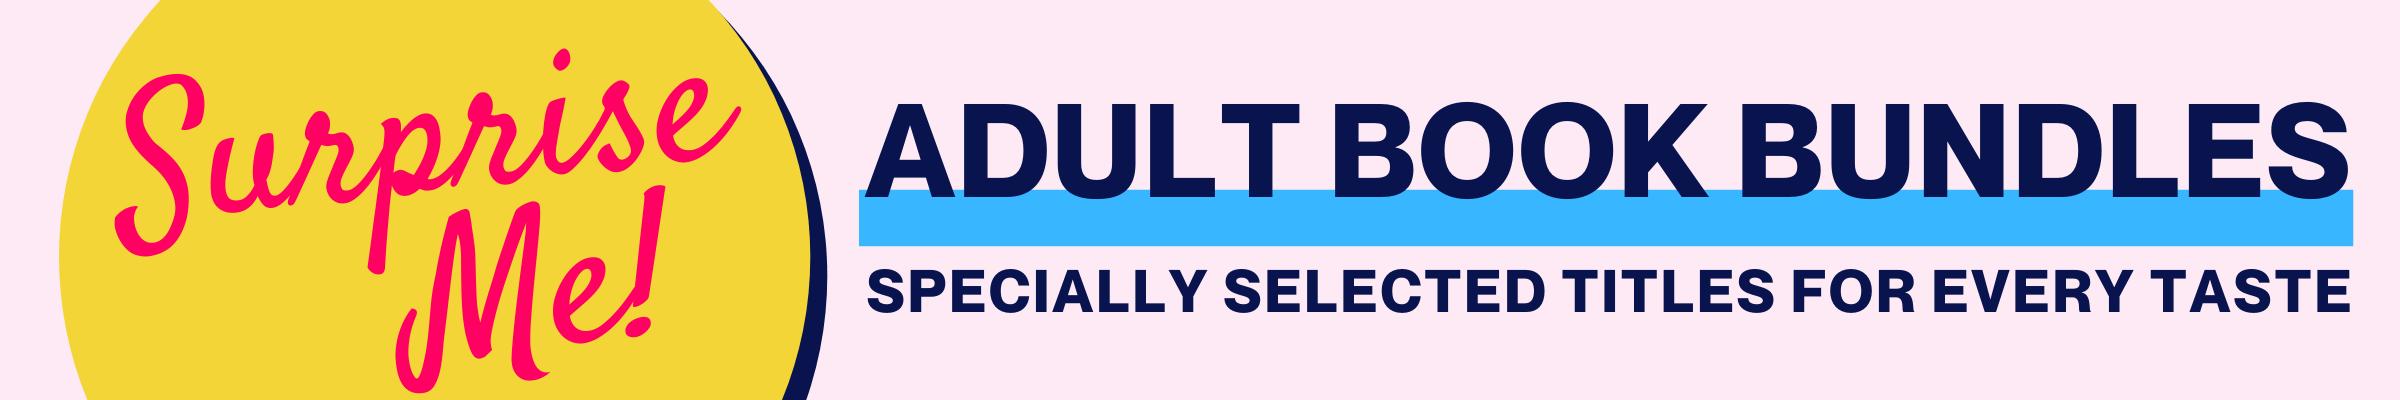 Adult Book Bundles